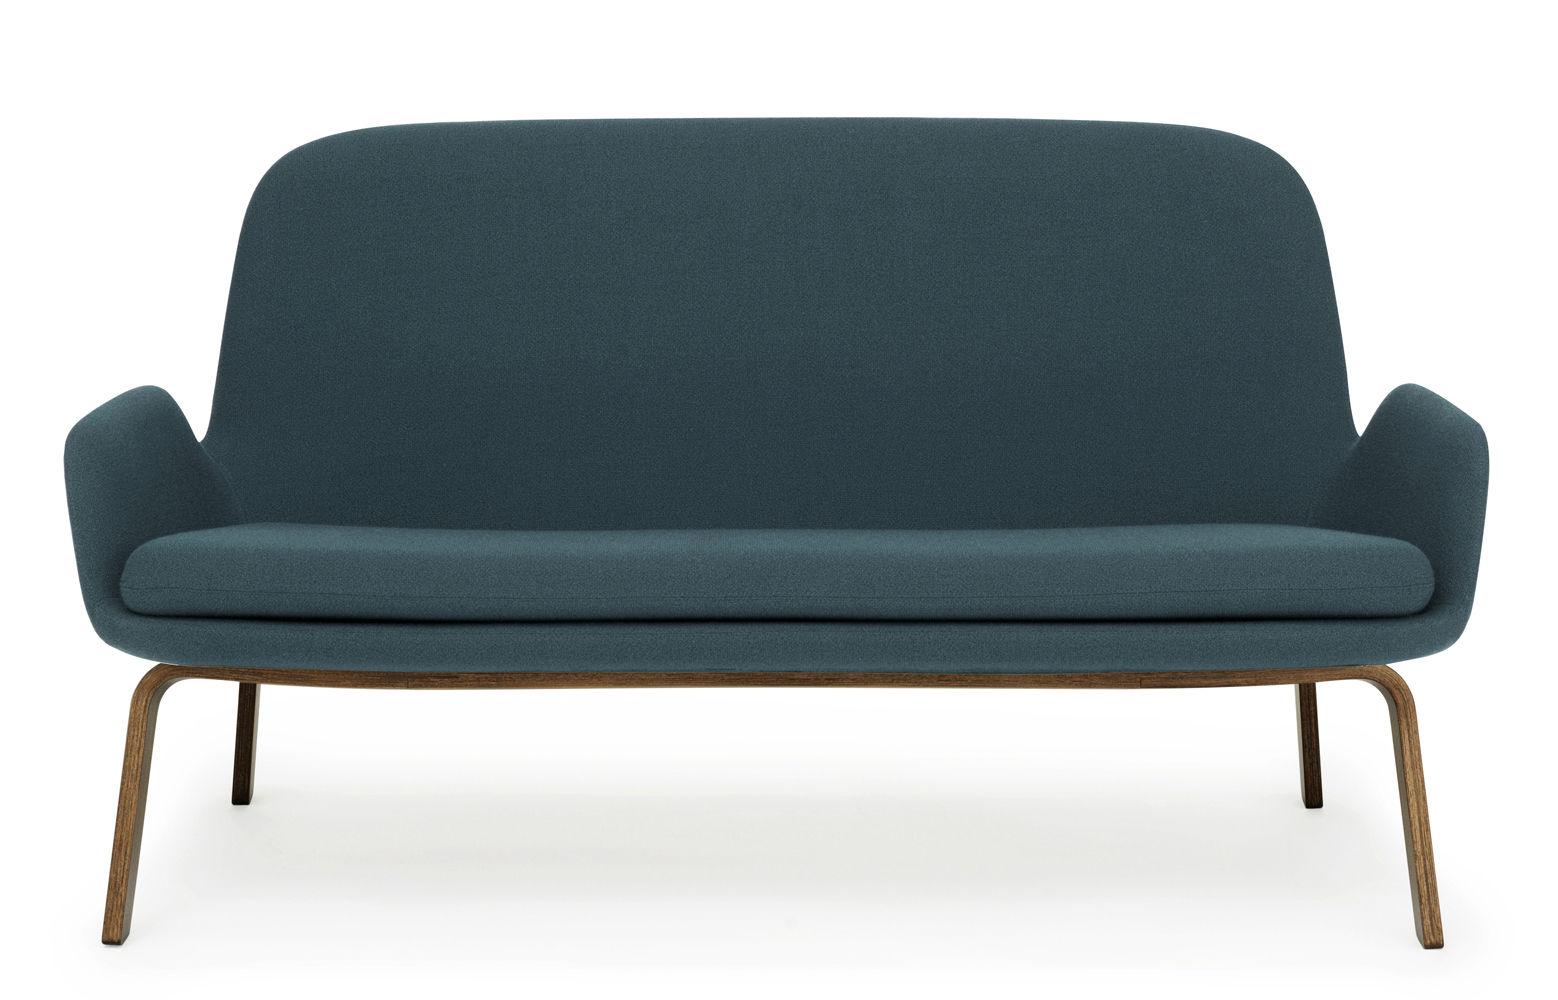 canap droit era l 145 cm tissu bois tissu bleu vert pieds noyer normann copenhagen. Black Bedroom Furniture Sets. Home Design Ideas